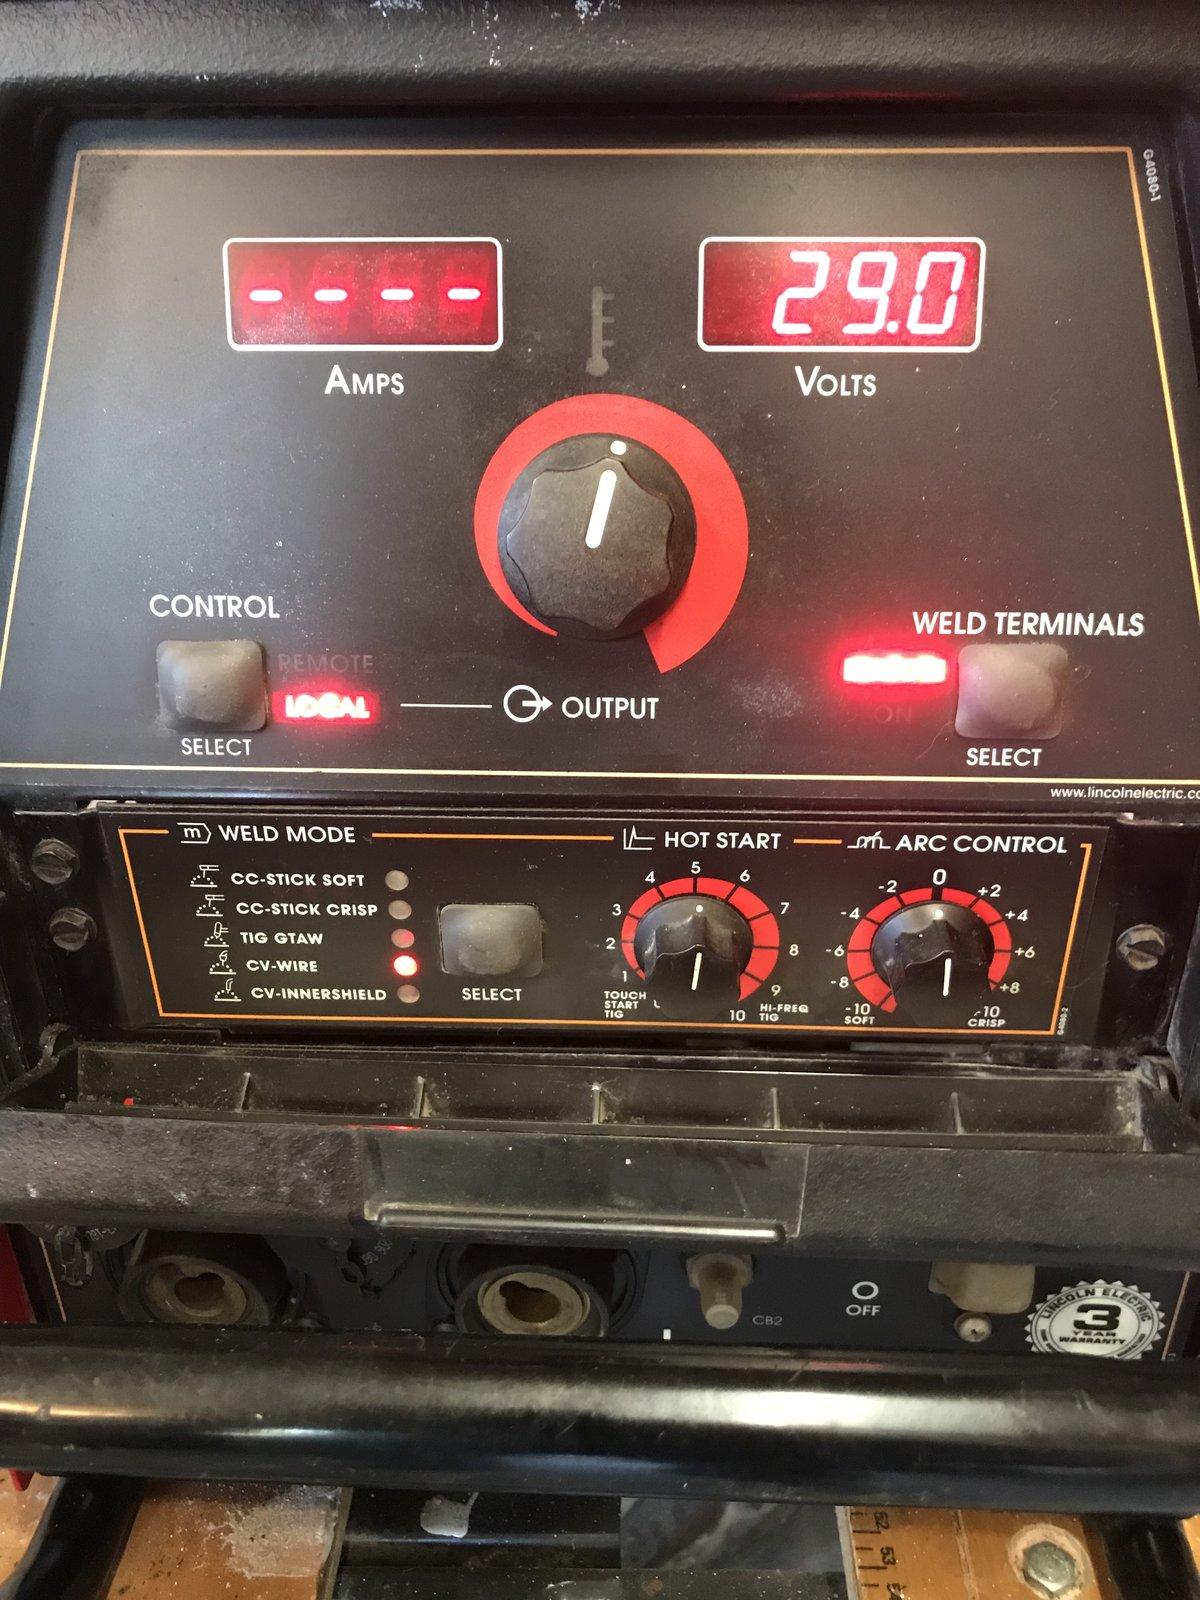 6F91971F-BBCA-4301-A0A3-1407502E945B.jpeg